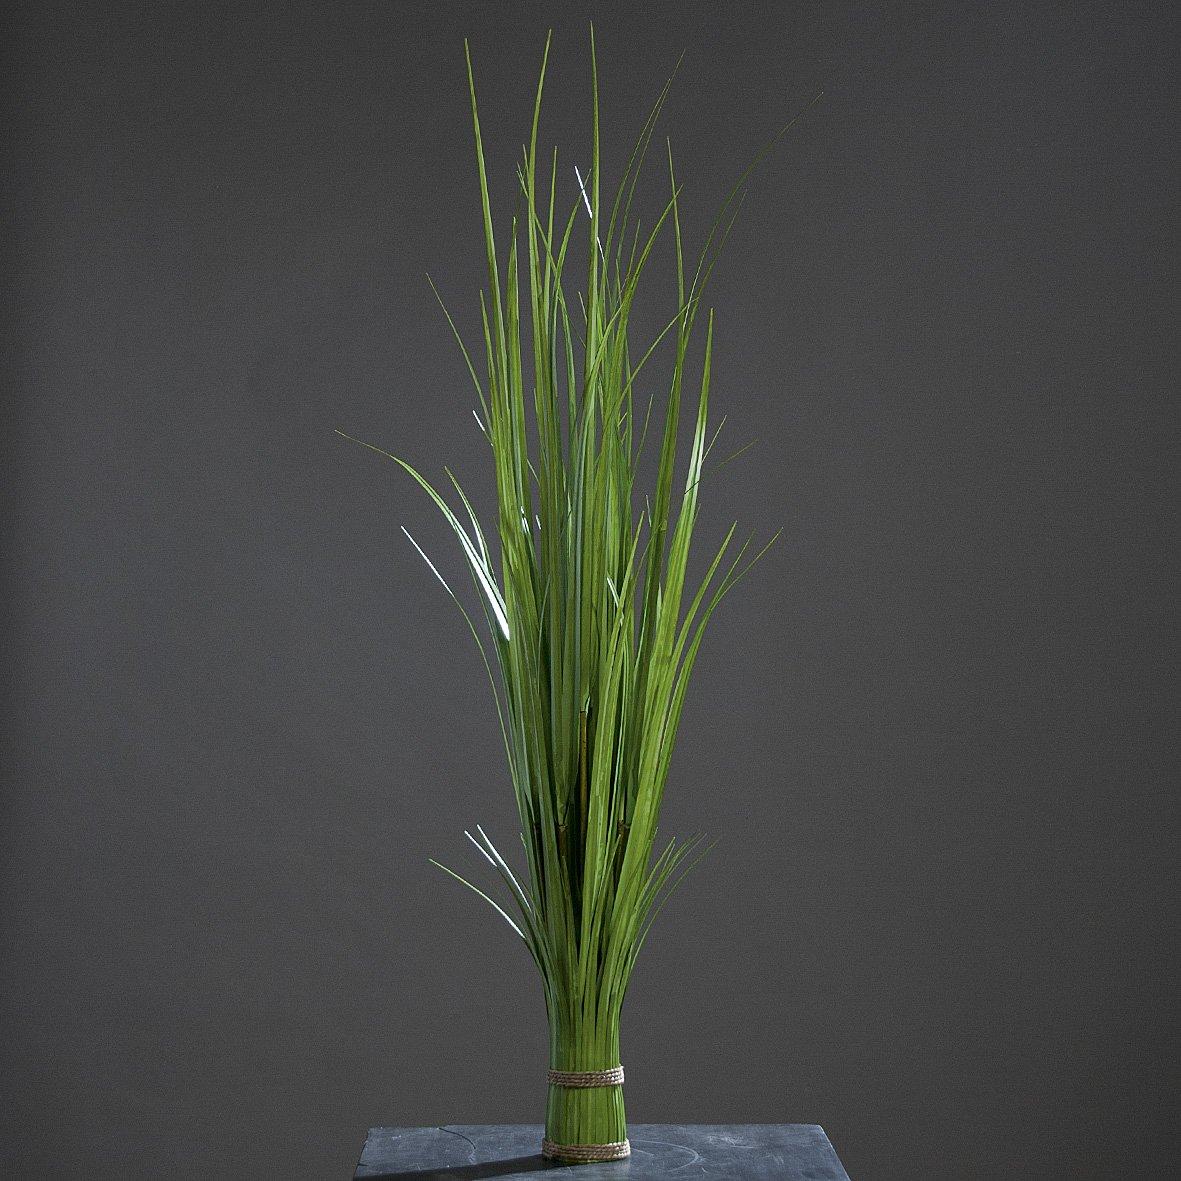 105 cm Schilfgras Dekogras Deko Gras Kunstgras Ziergras Kunstpflanze Pflanze